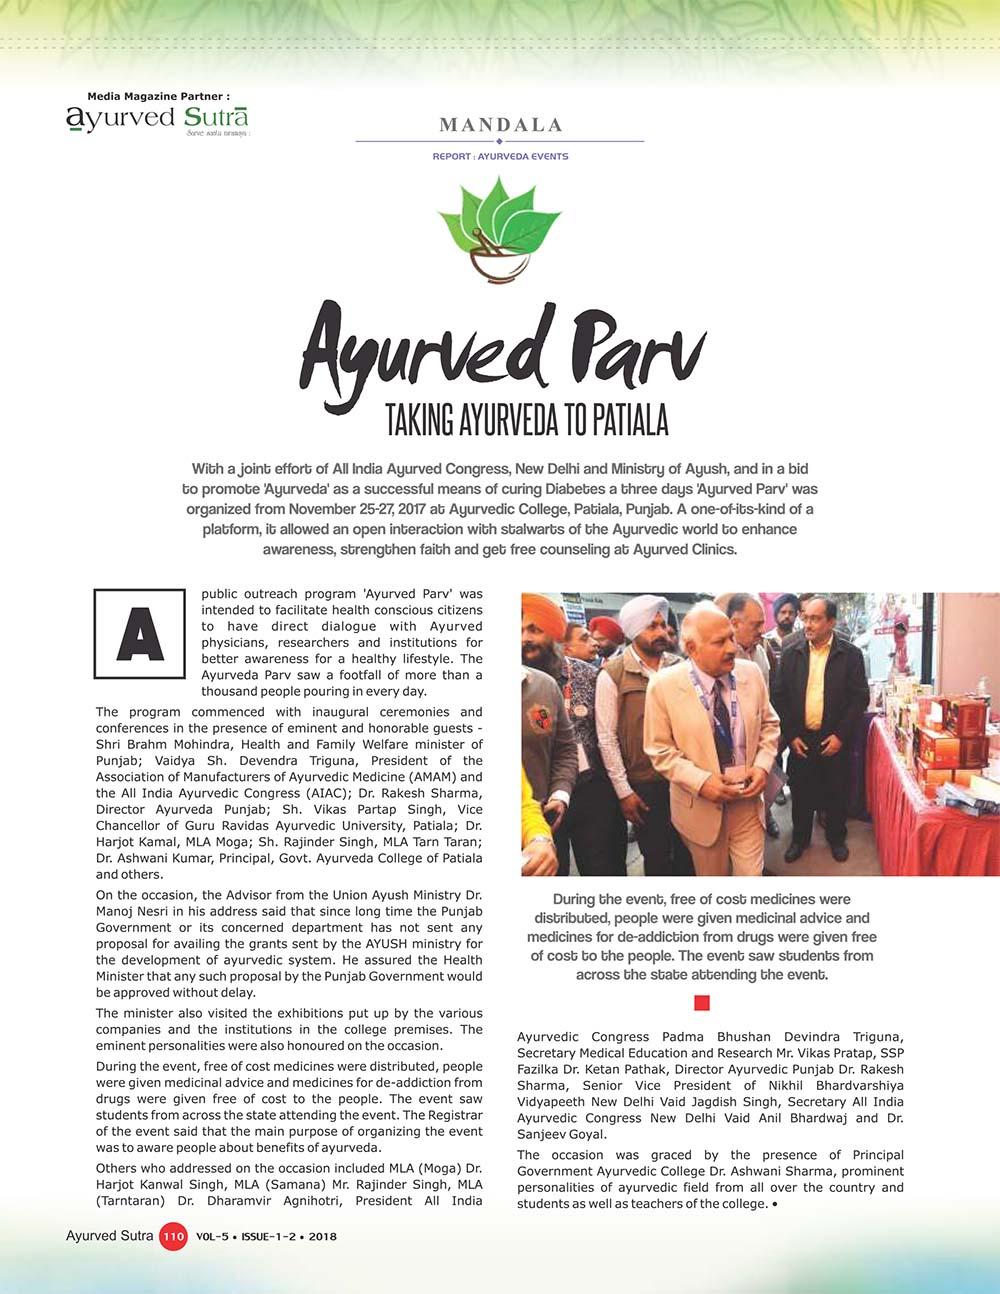 Ayurvedsutra Vol 05 issue 01 02 112 - Ayurved Parv: Taking Ayurveda to Patiala